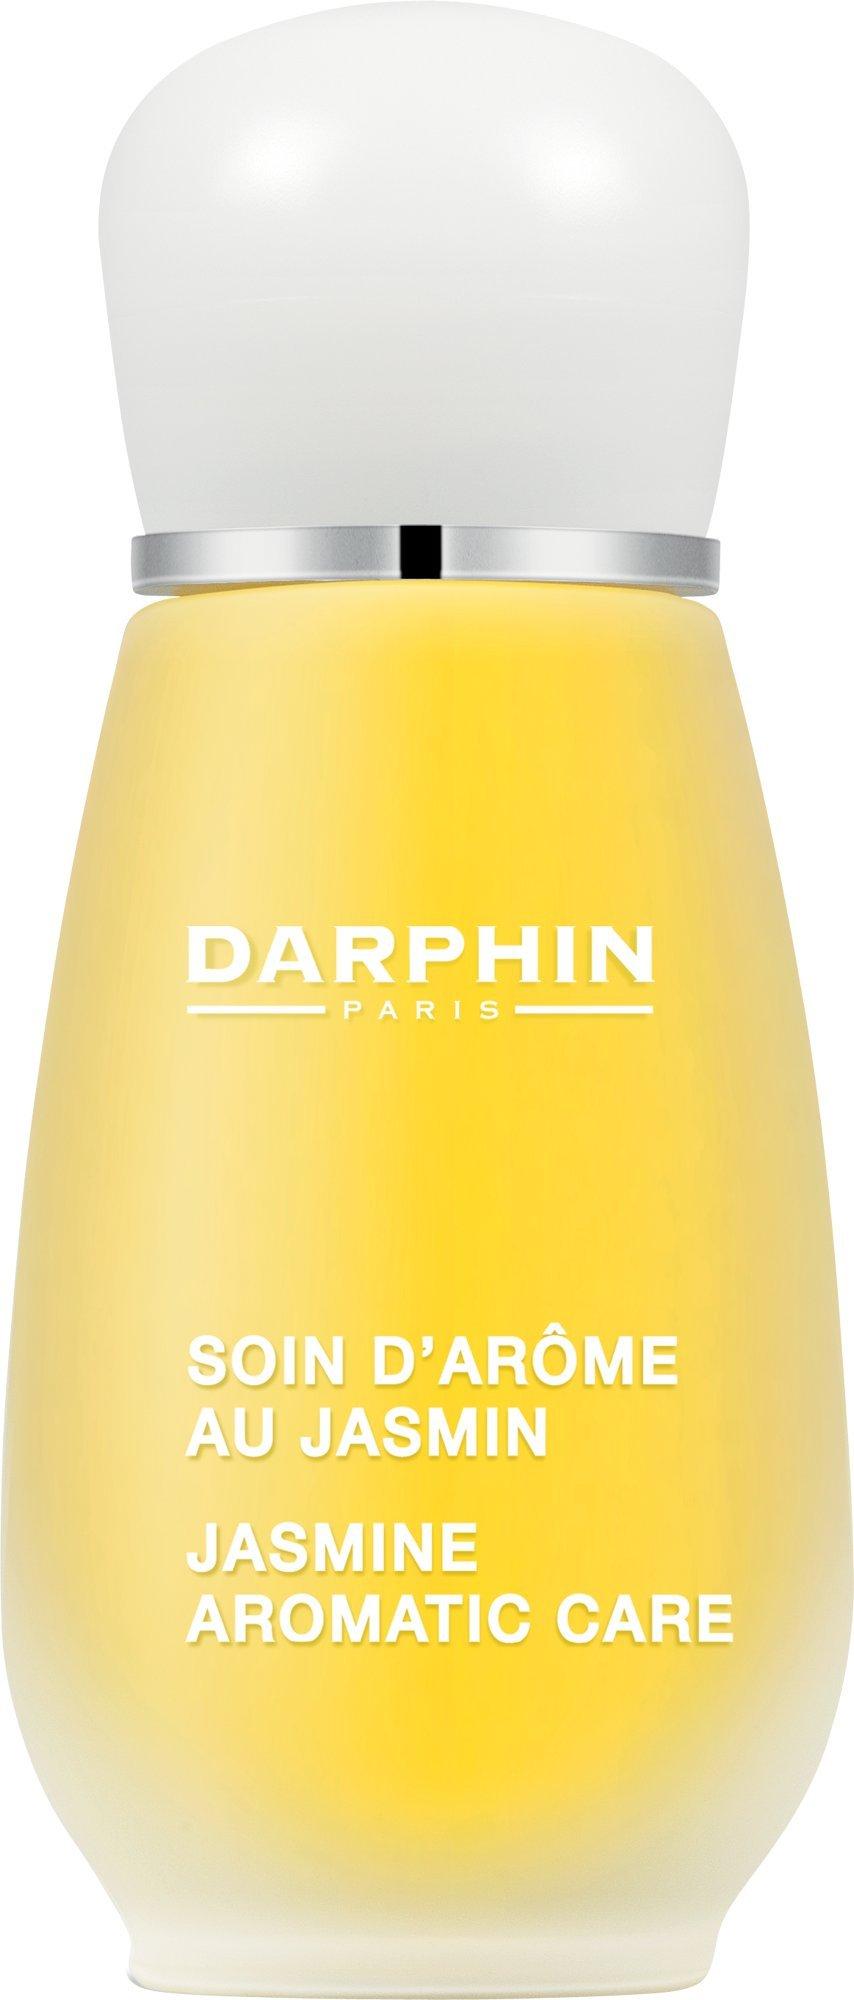 Darphin Jasmine Aromatic Care Essential Oil Elixir for Women, 0.5 Ounce